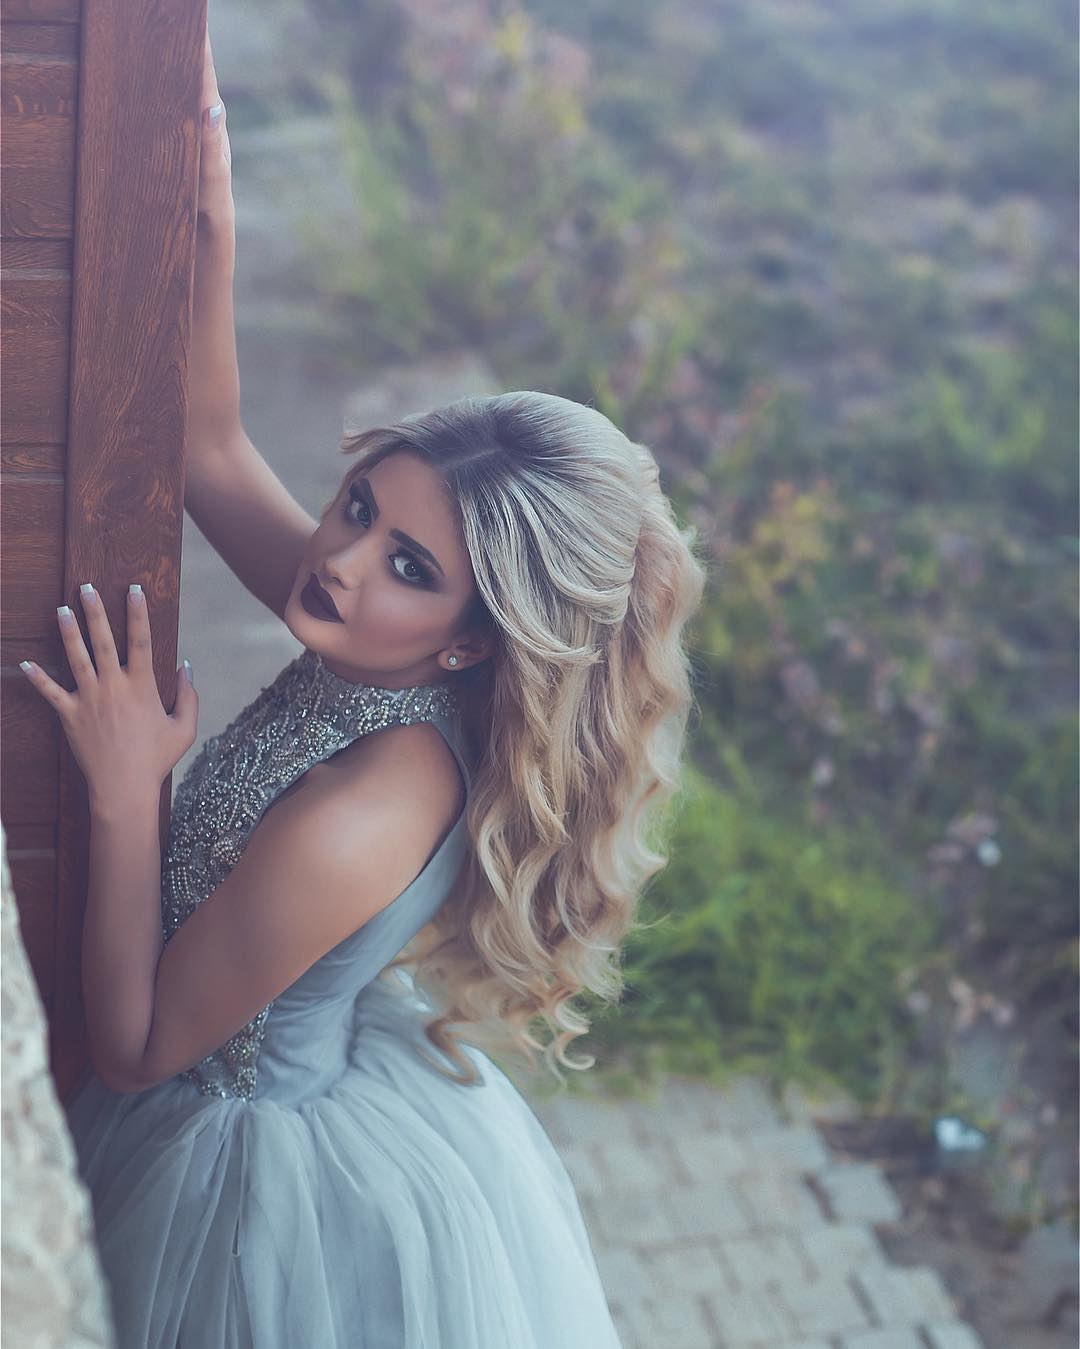 9d9373eaedb8 ... Beading Short Prom Dress Robe de soiree Sparkly High Neck Party Dress -  Thumbnail 3 ...